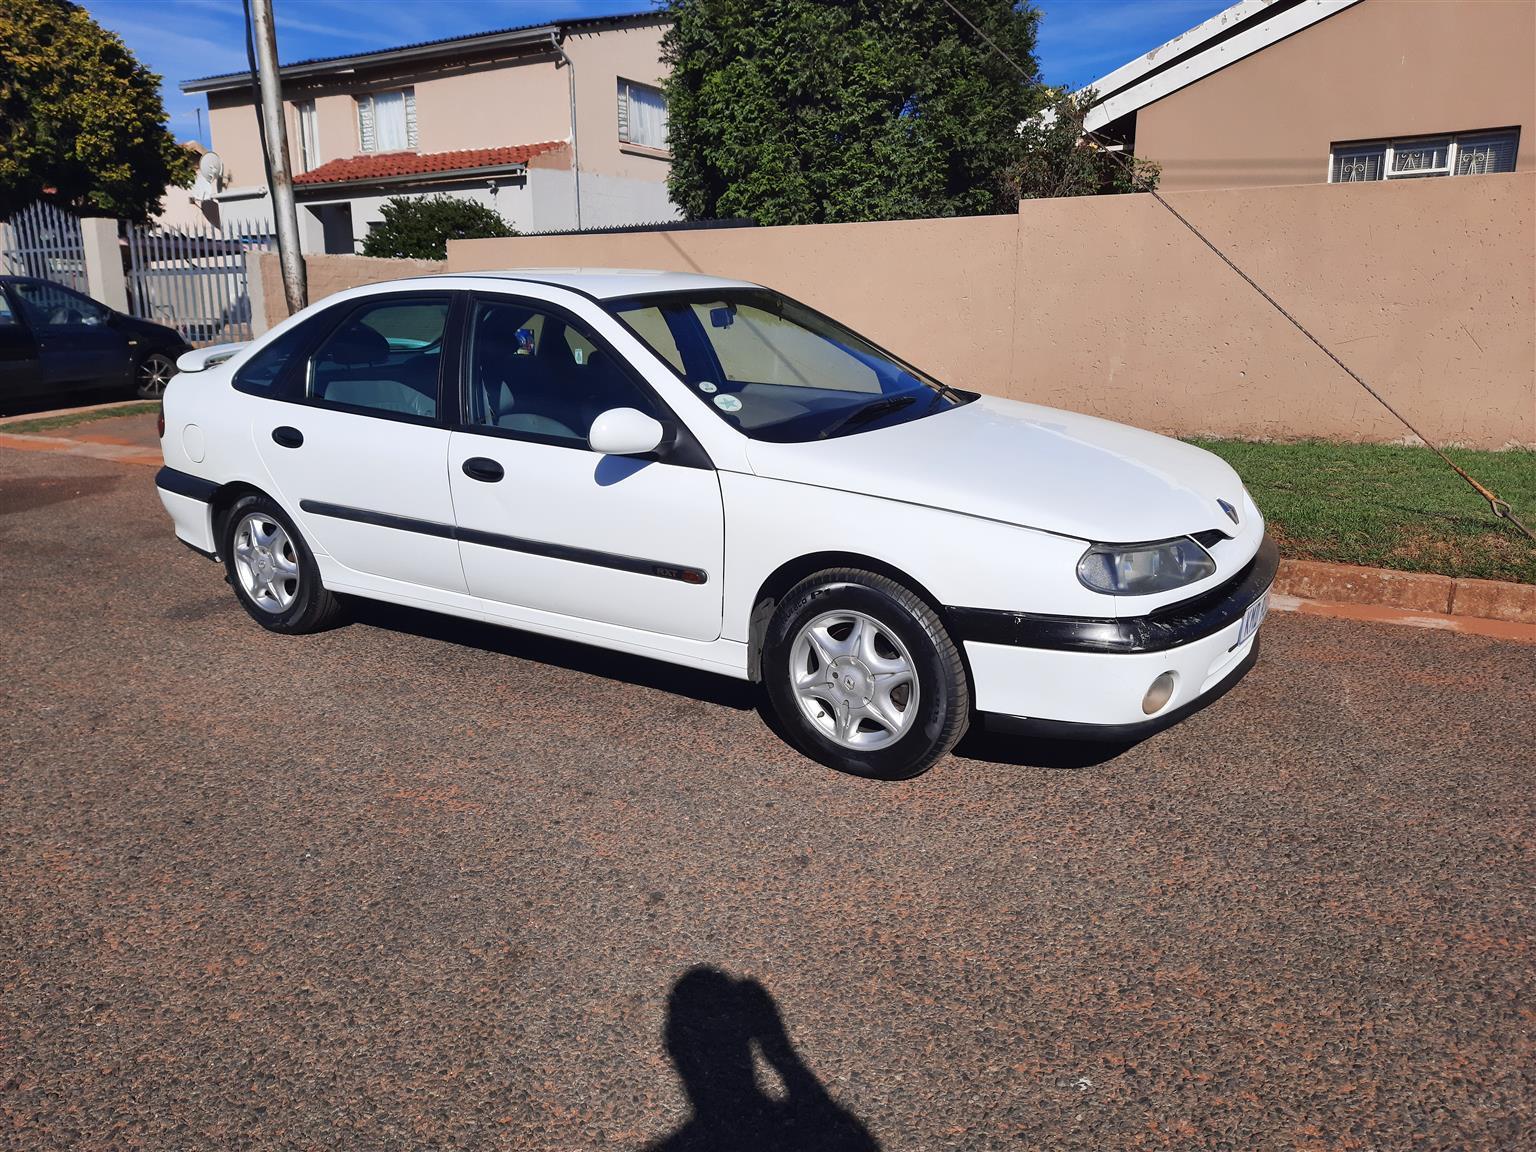 2000 Renault Laguna 2.0 Expression